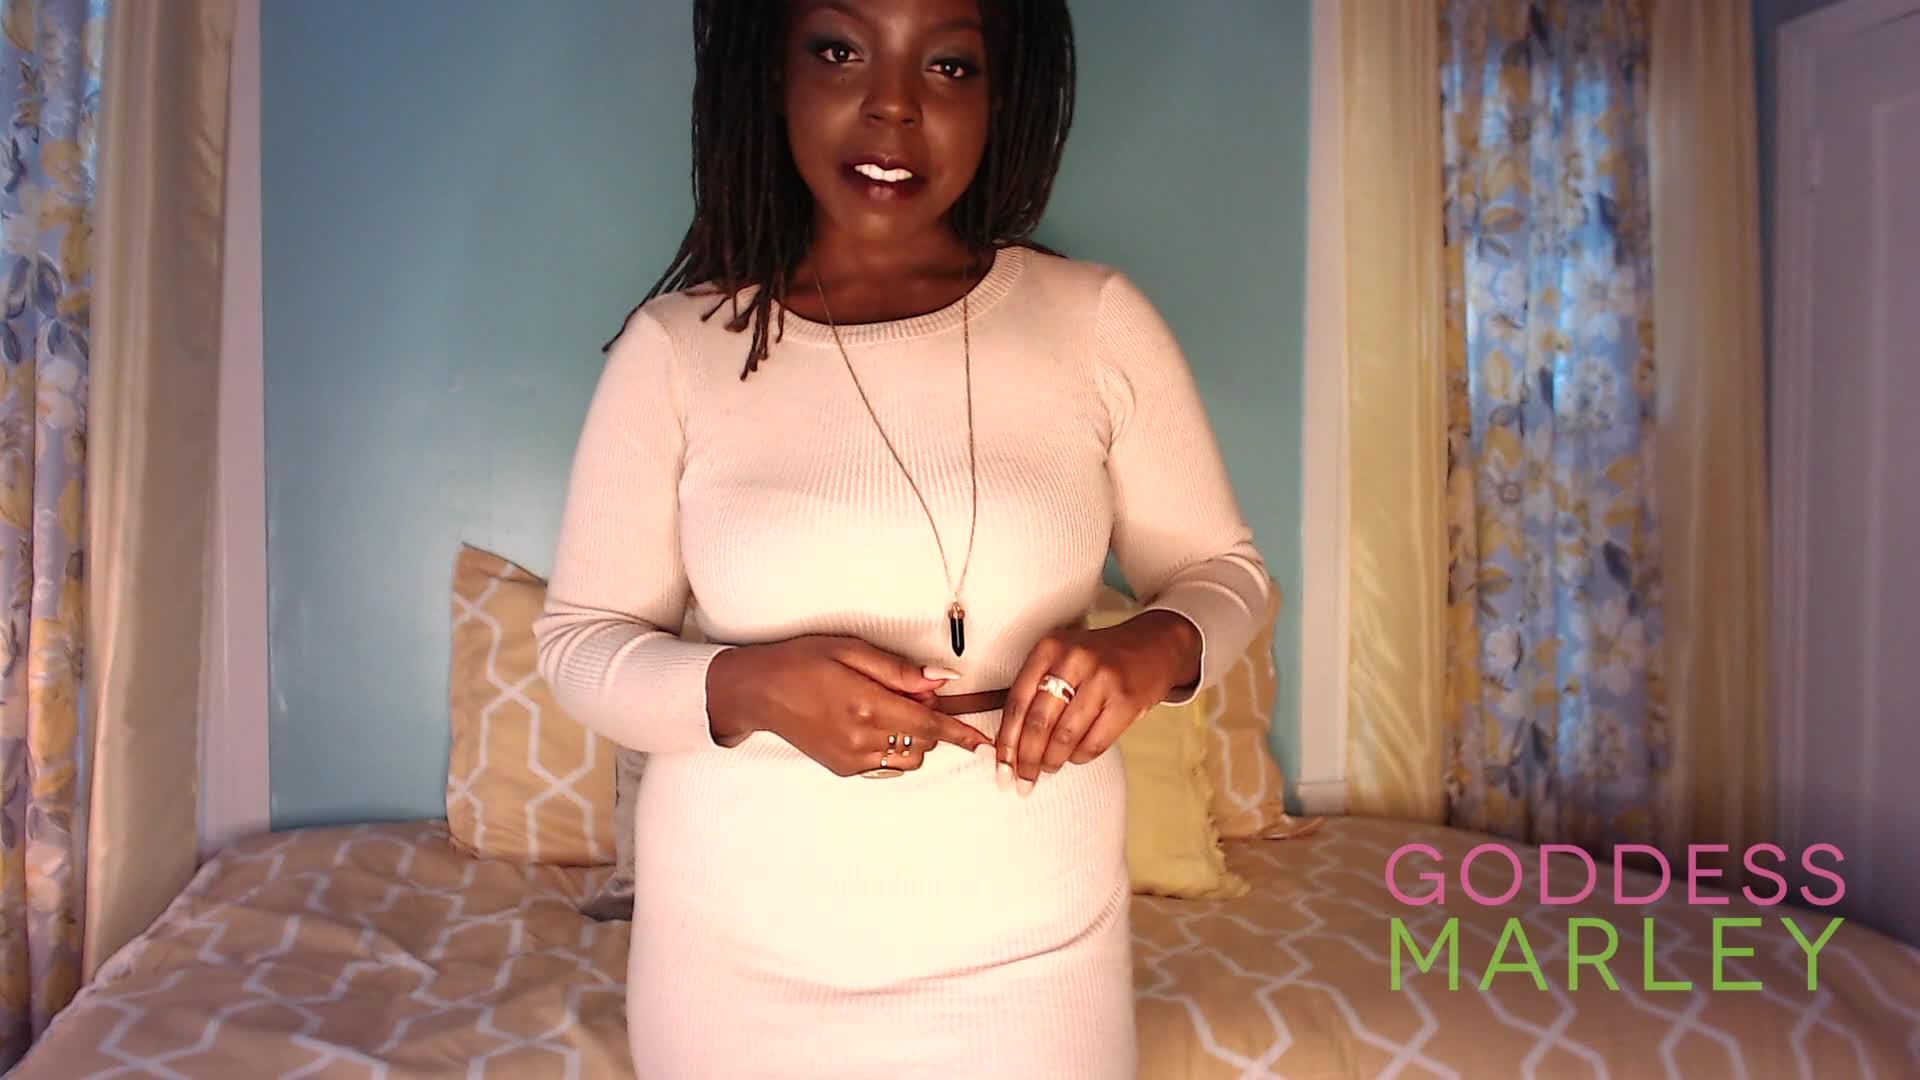 GoddessMarley's vid